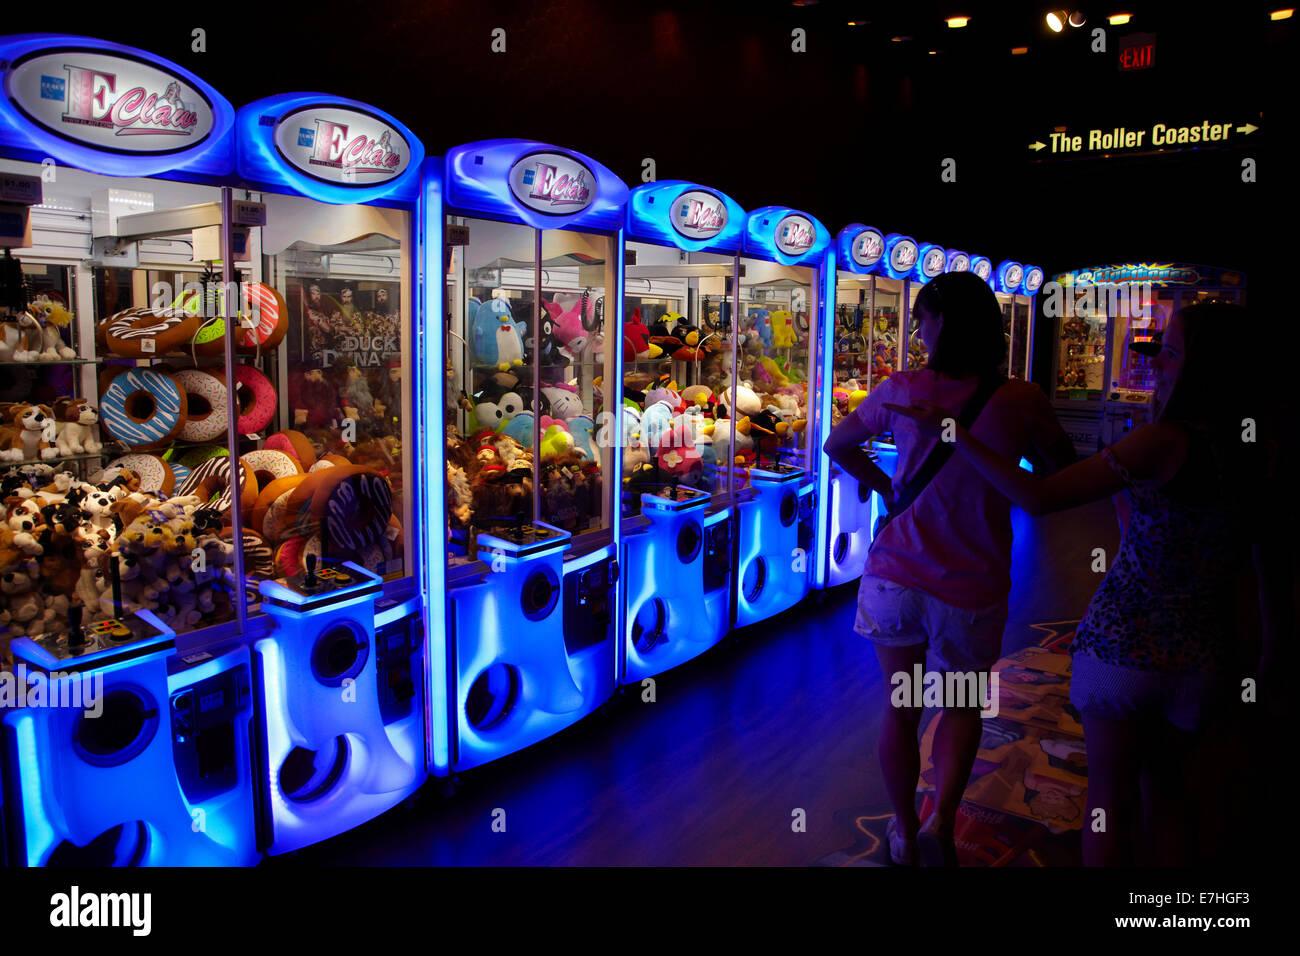 Games arcade at New York-New York Hotel and Casino, Las Vegas, Nevada, USA - Stock Image